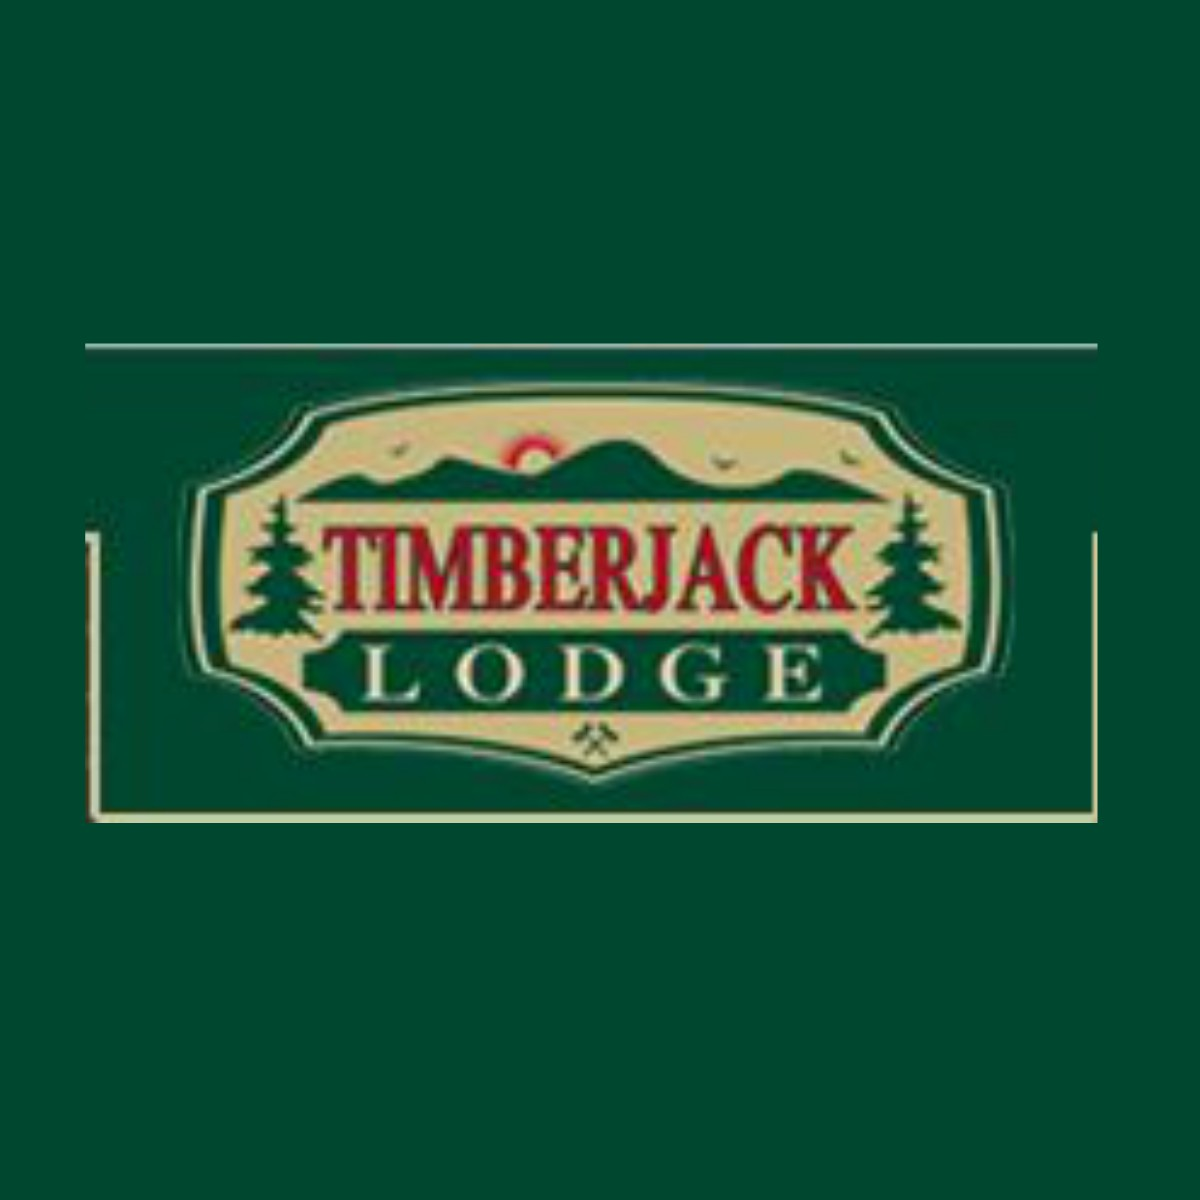 Timberjack Lodge